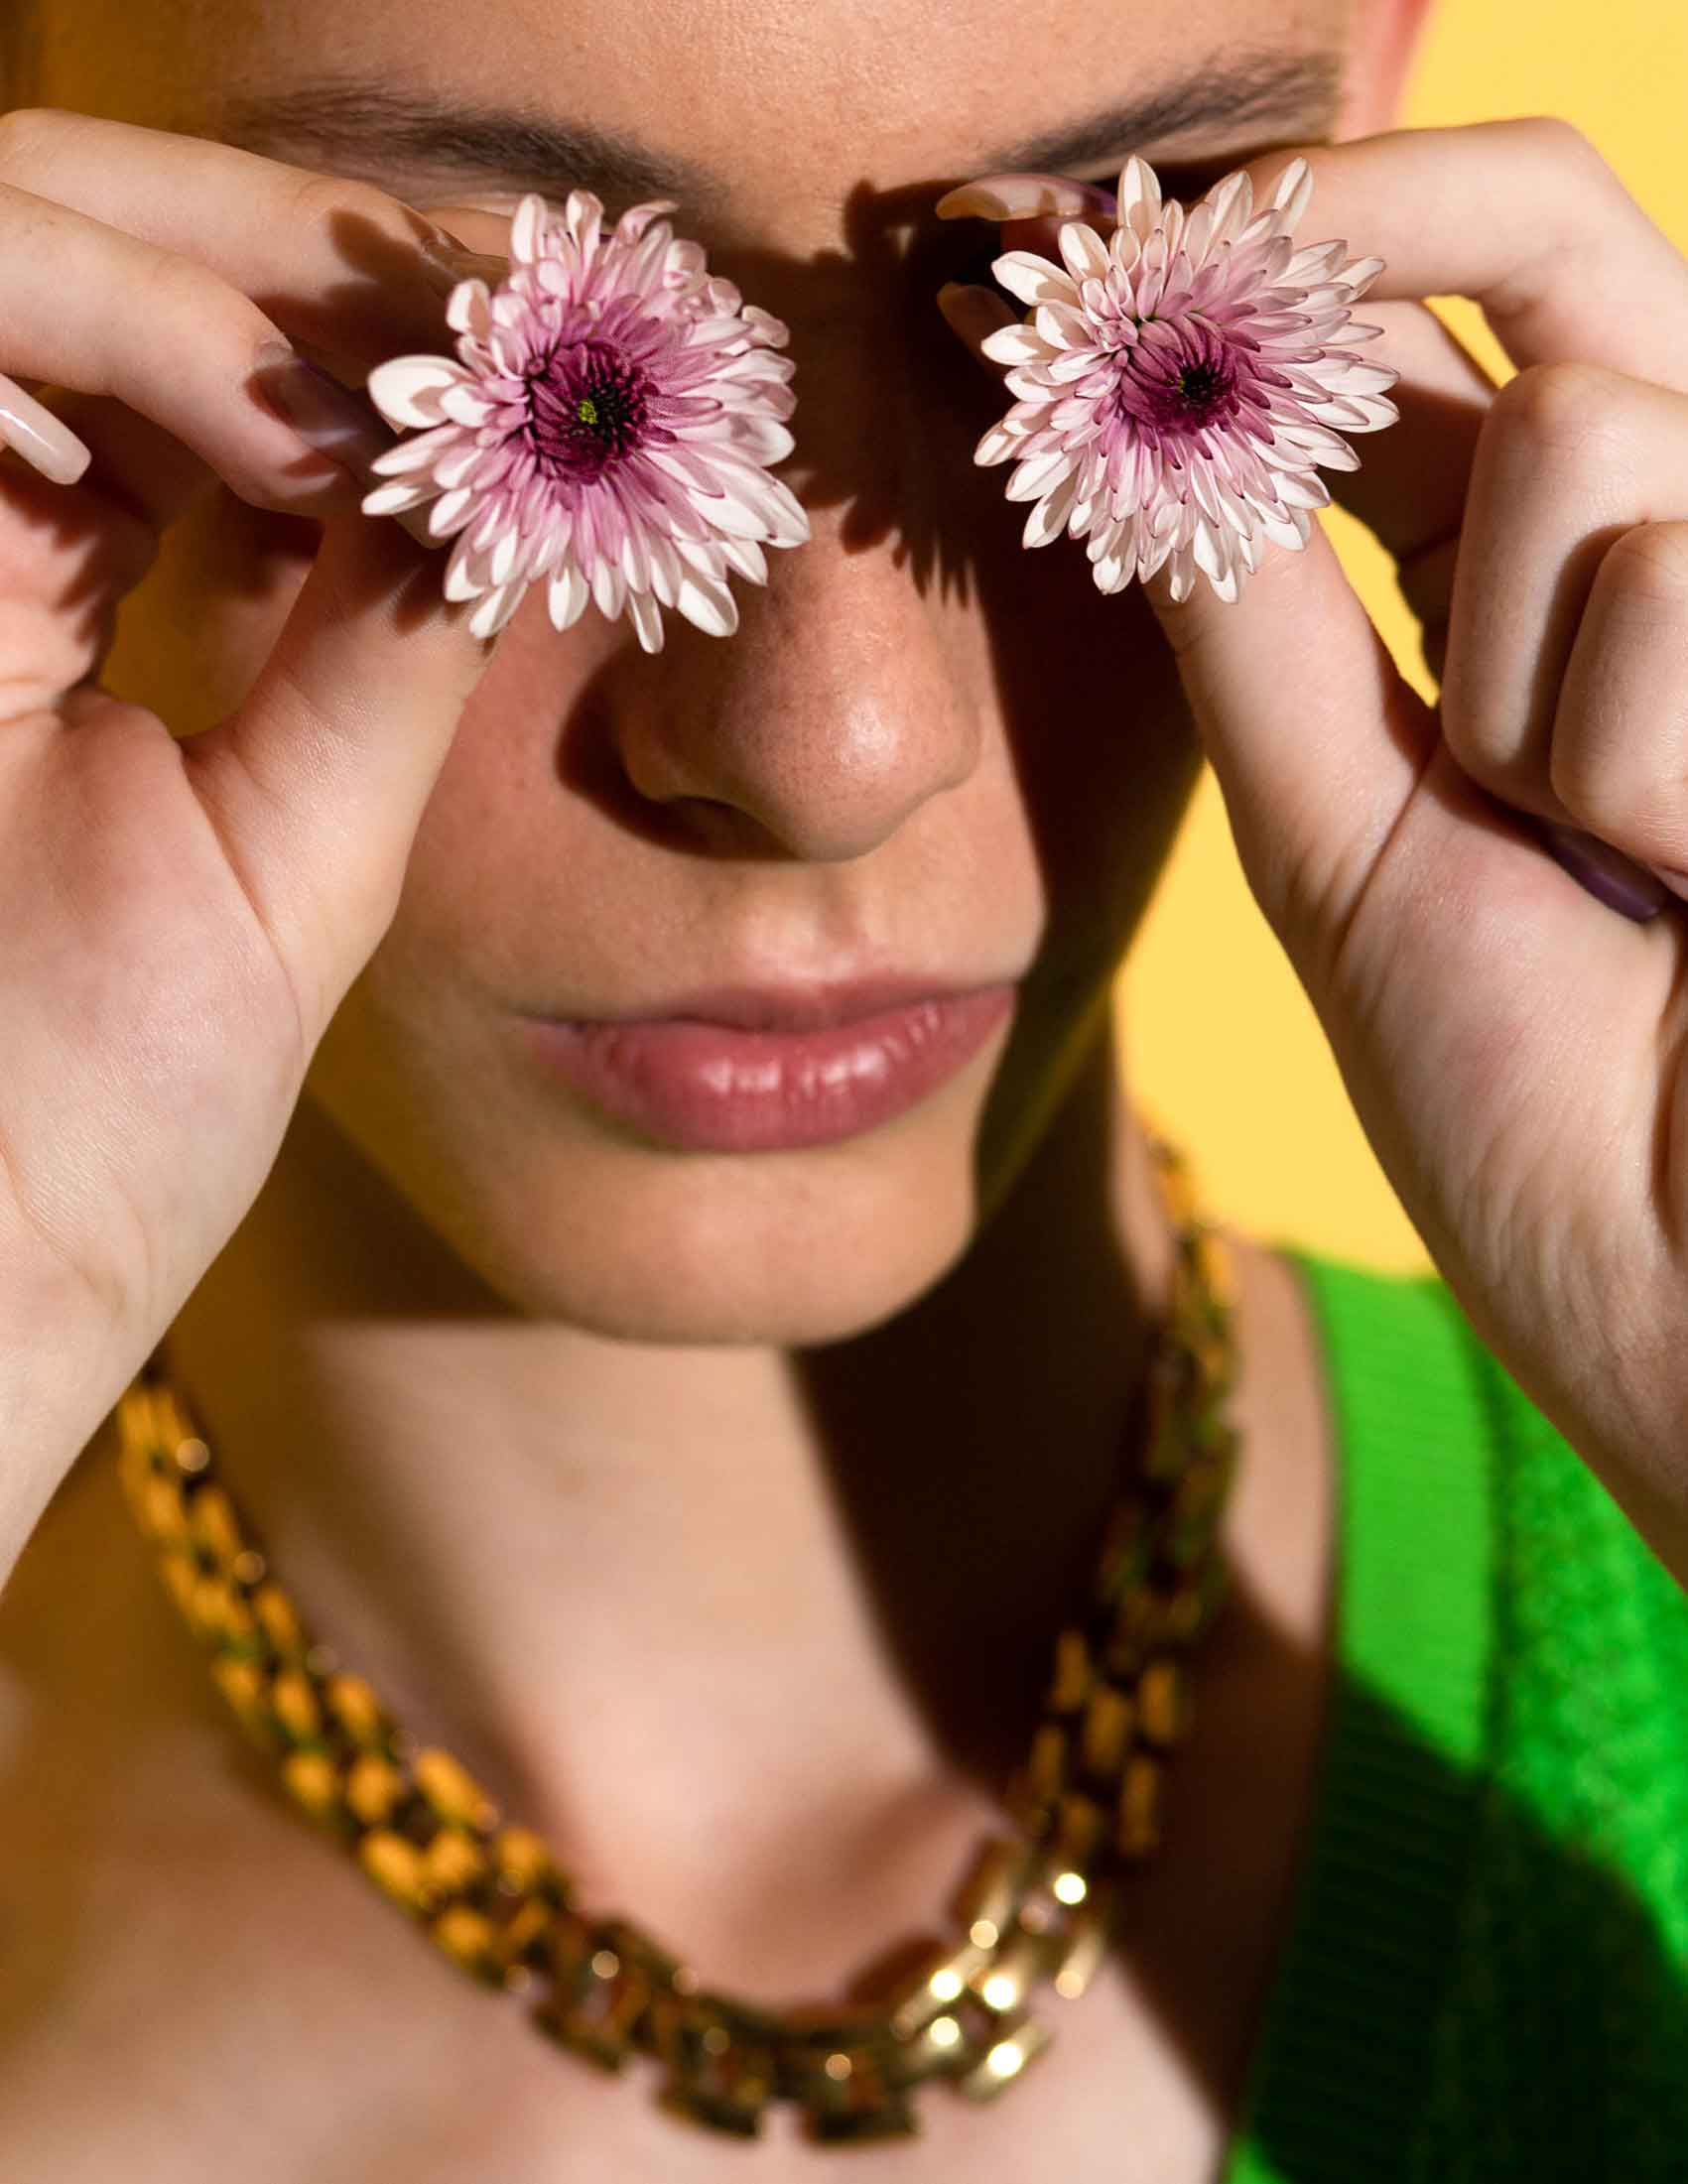 Photographer: Daniel Noy Dor Model: Idan Marin Stylist: Maayan Naftali Makeup: Roni Ben Ami Assistant: Tomer Hershkovitz10